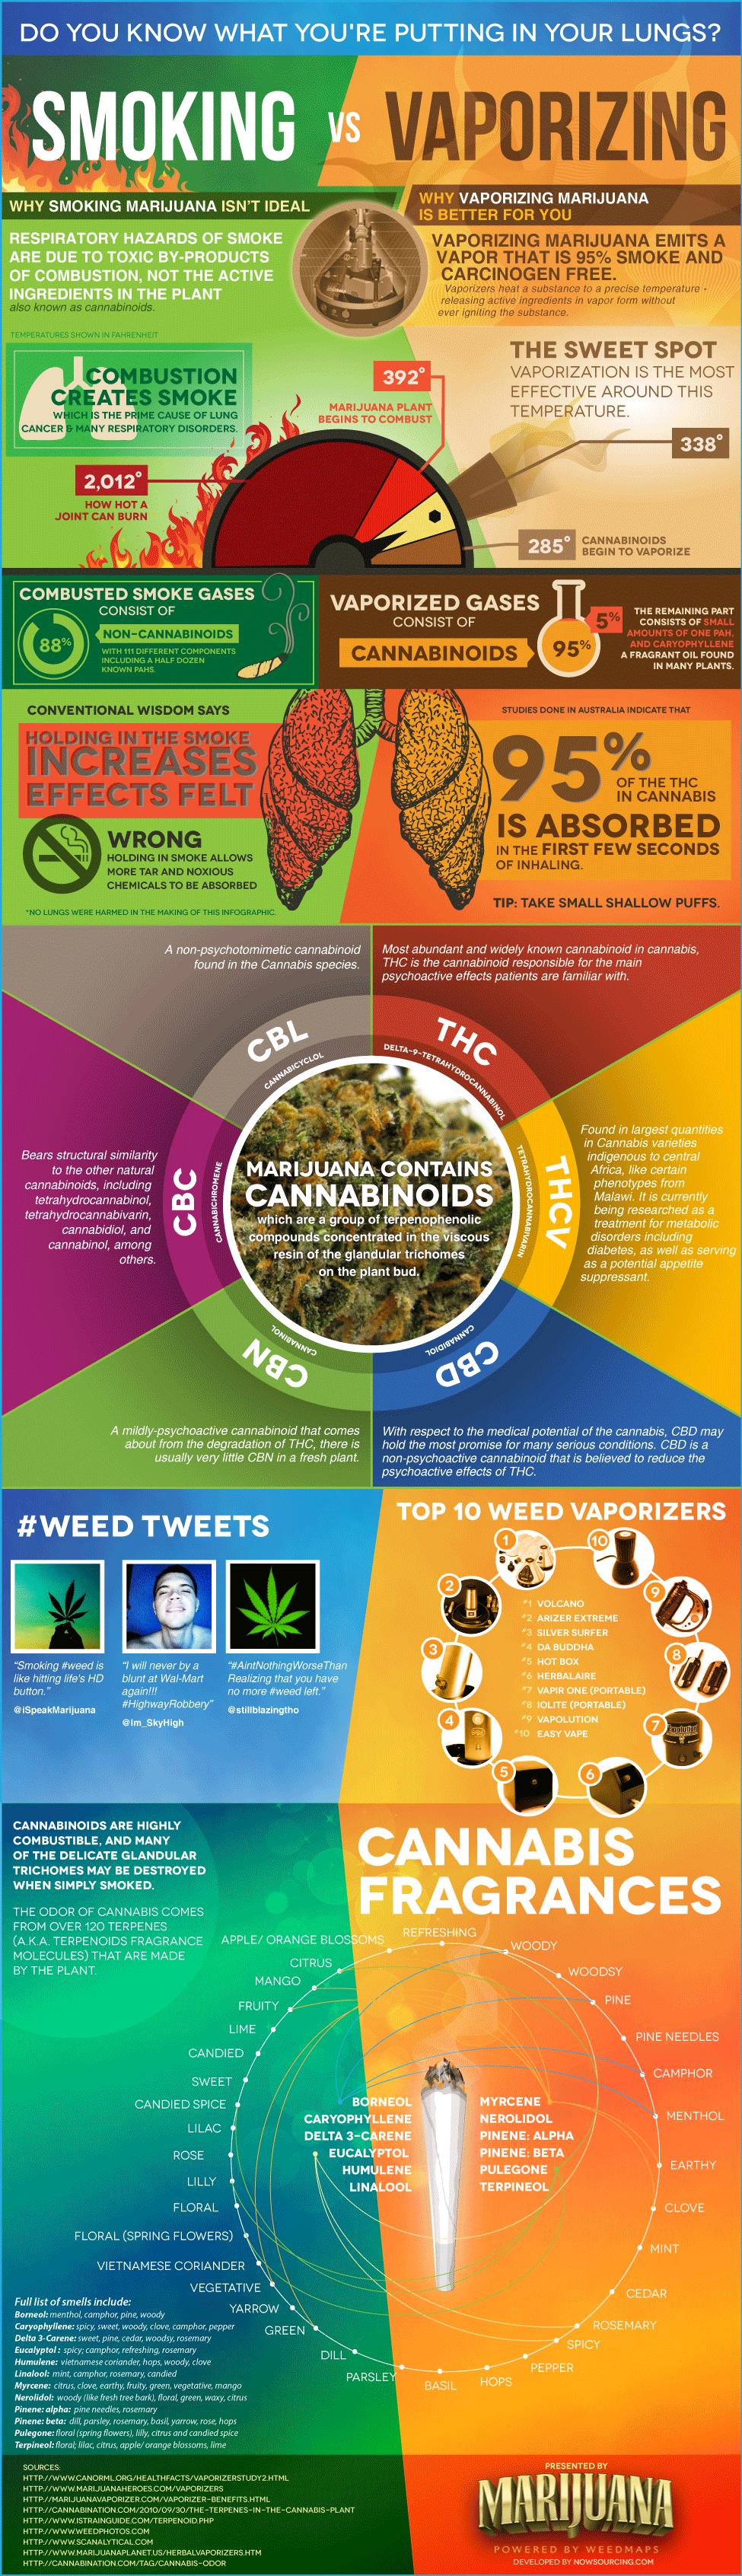 Weed Vaporizer vs Smoking-Infographic